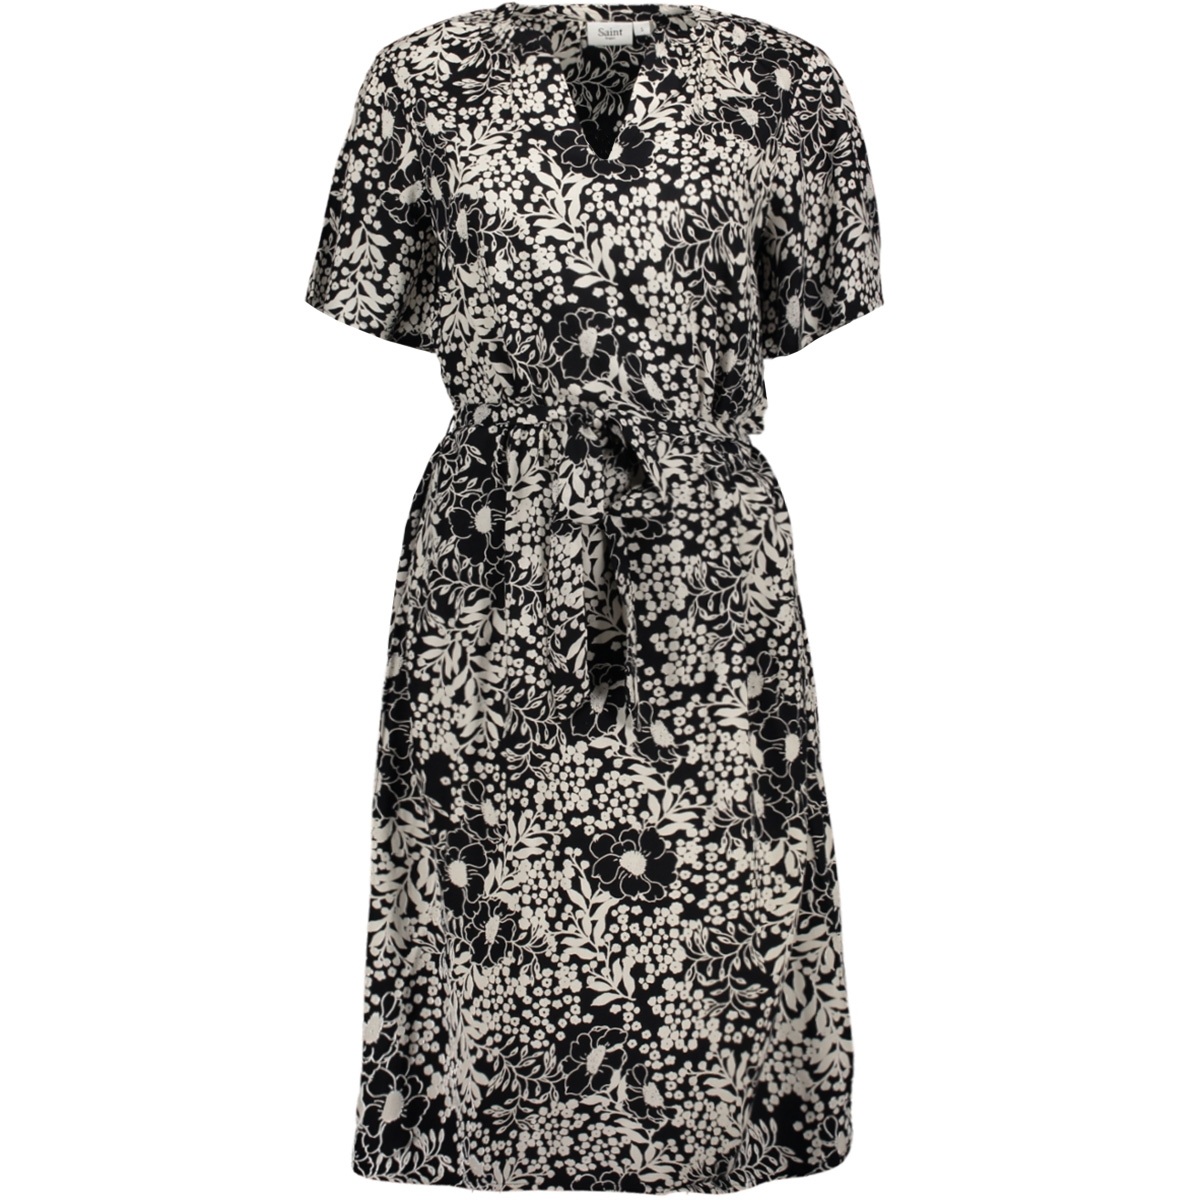 louisasz dress 30510107 saint tropez jurk glam flower black 600054